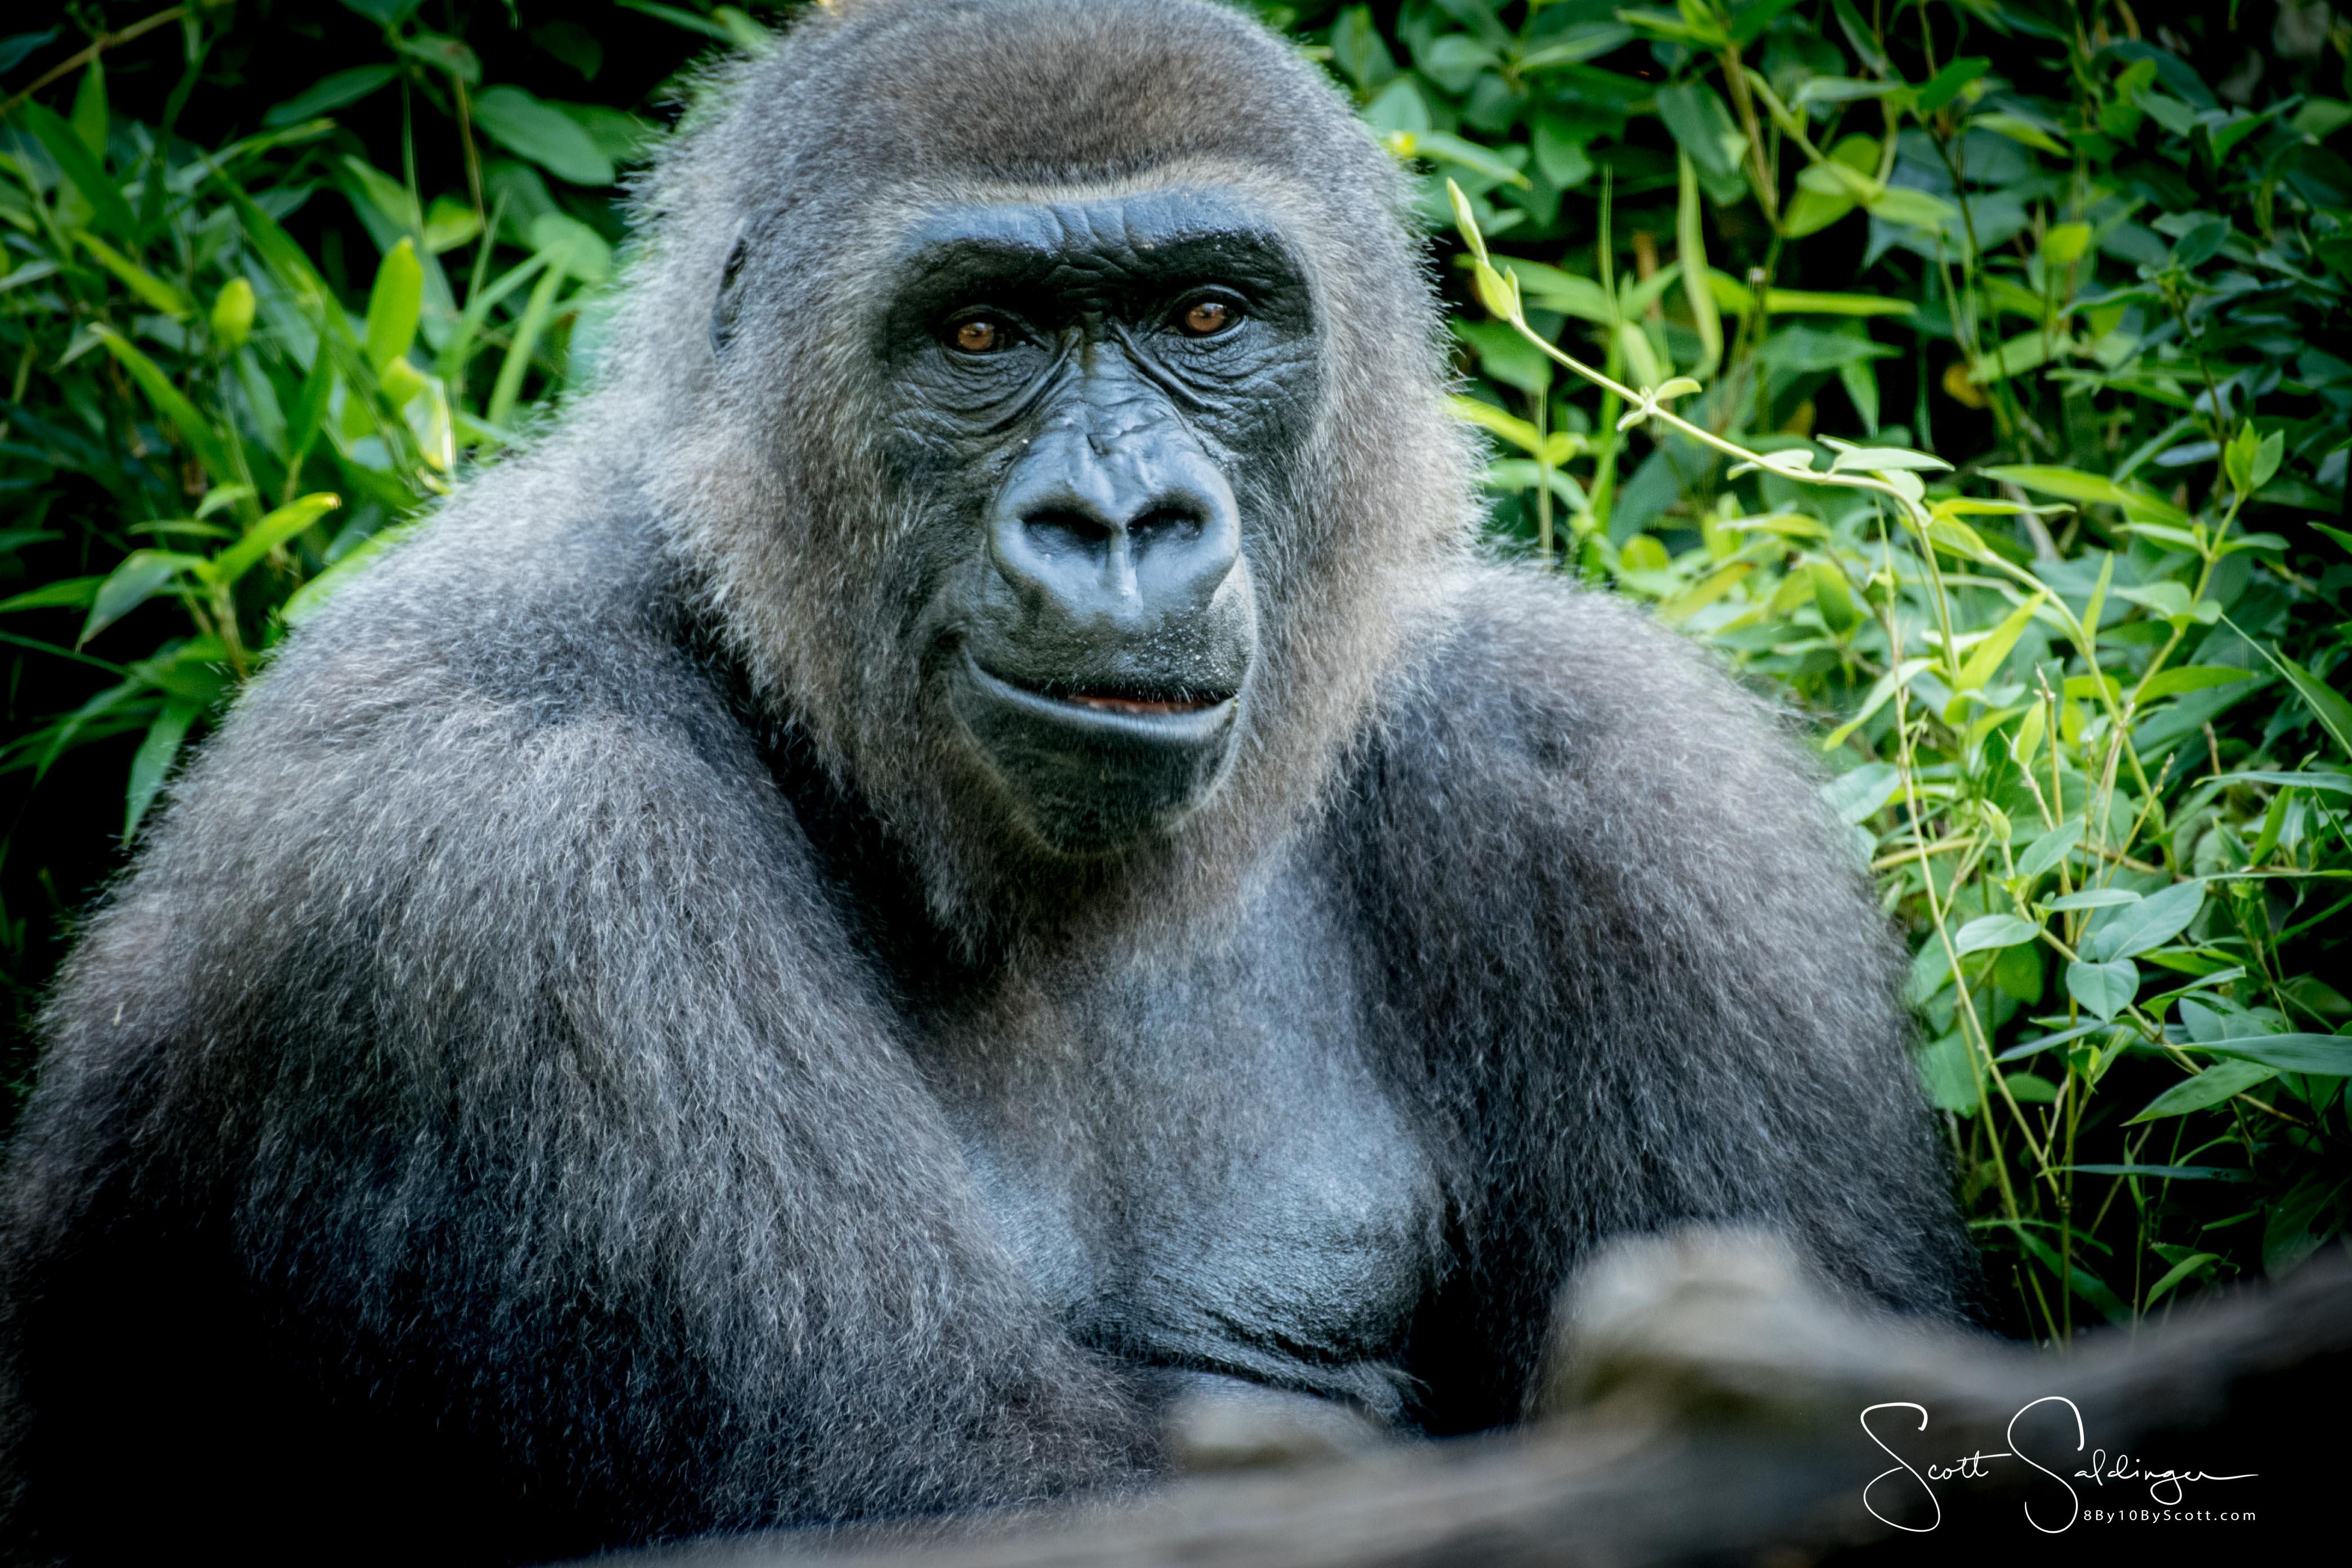 Apes-5957